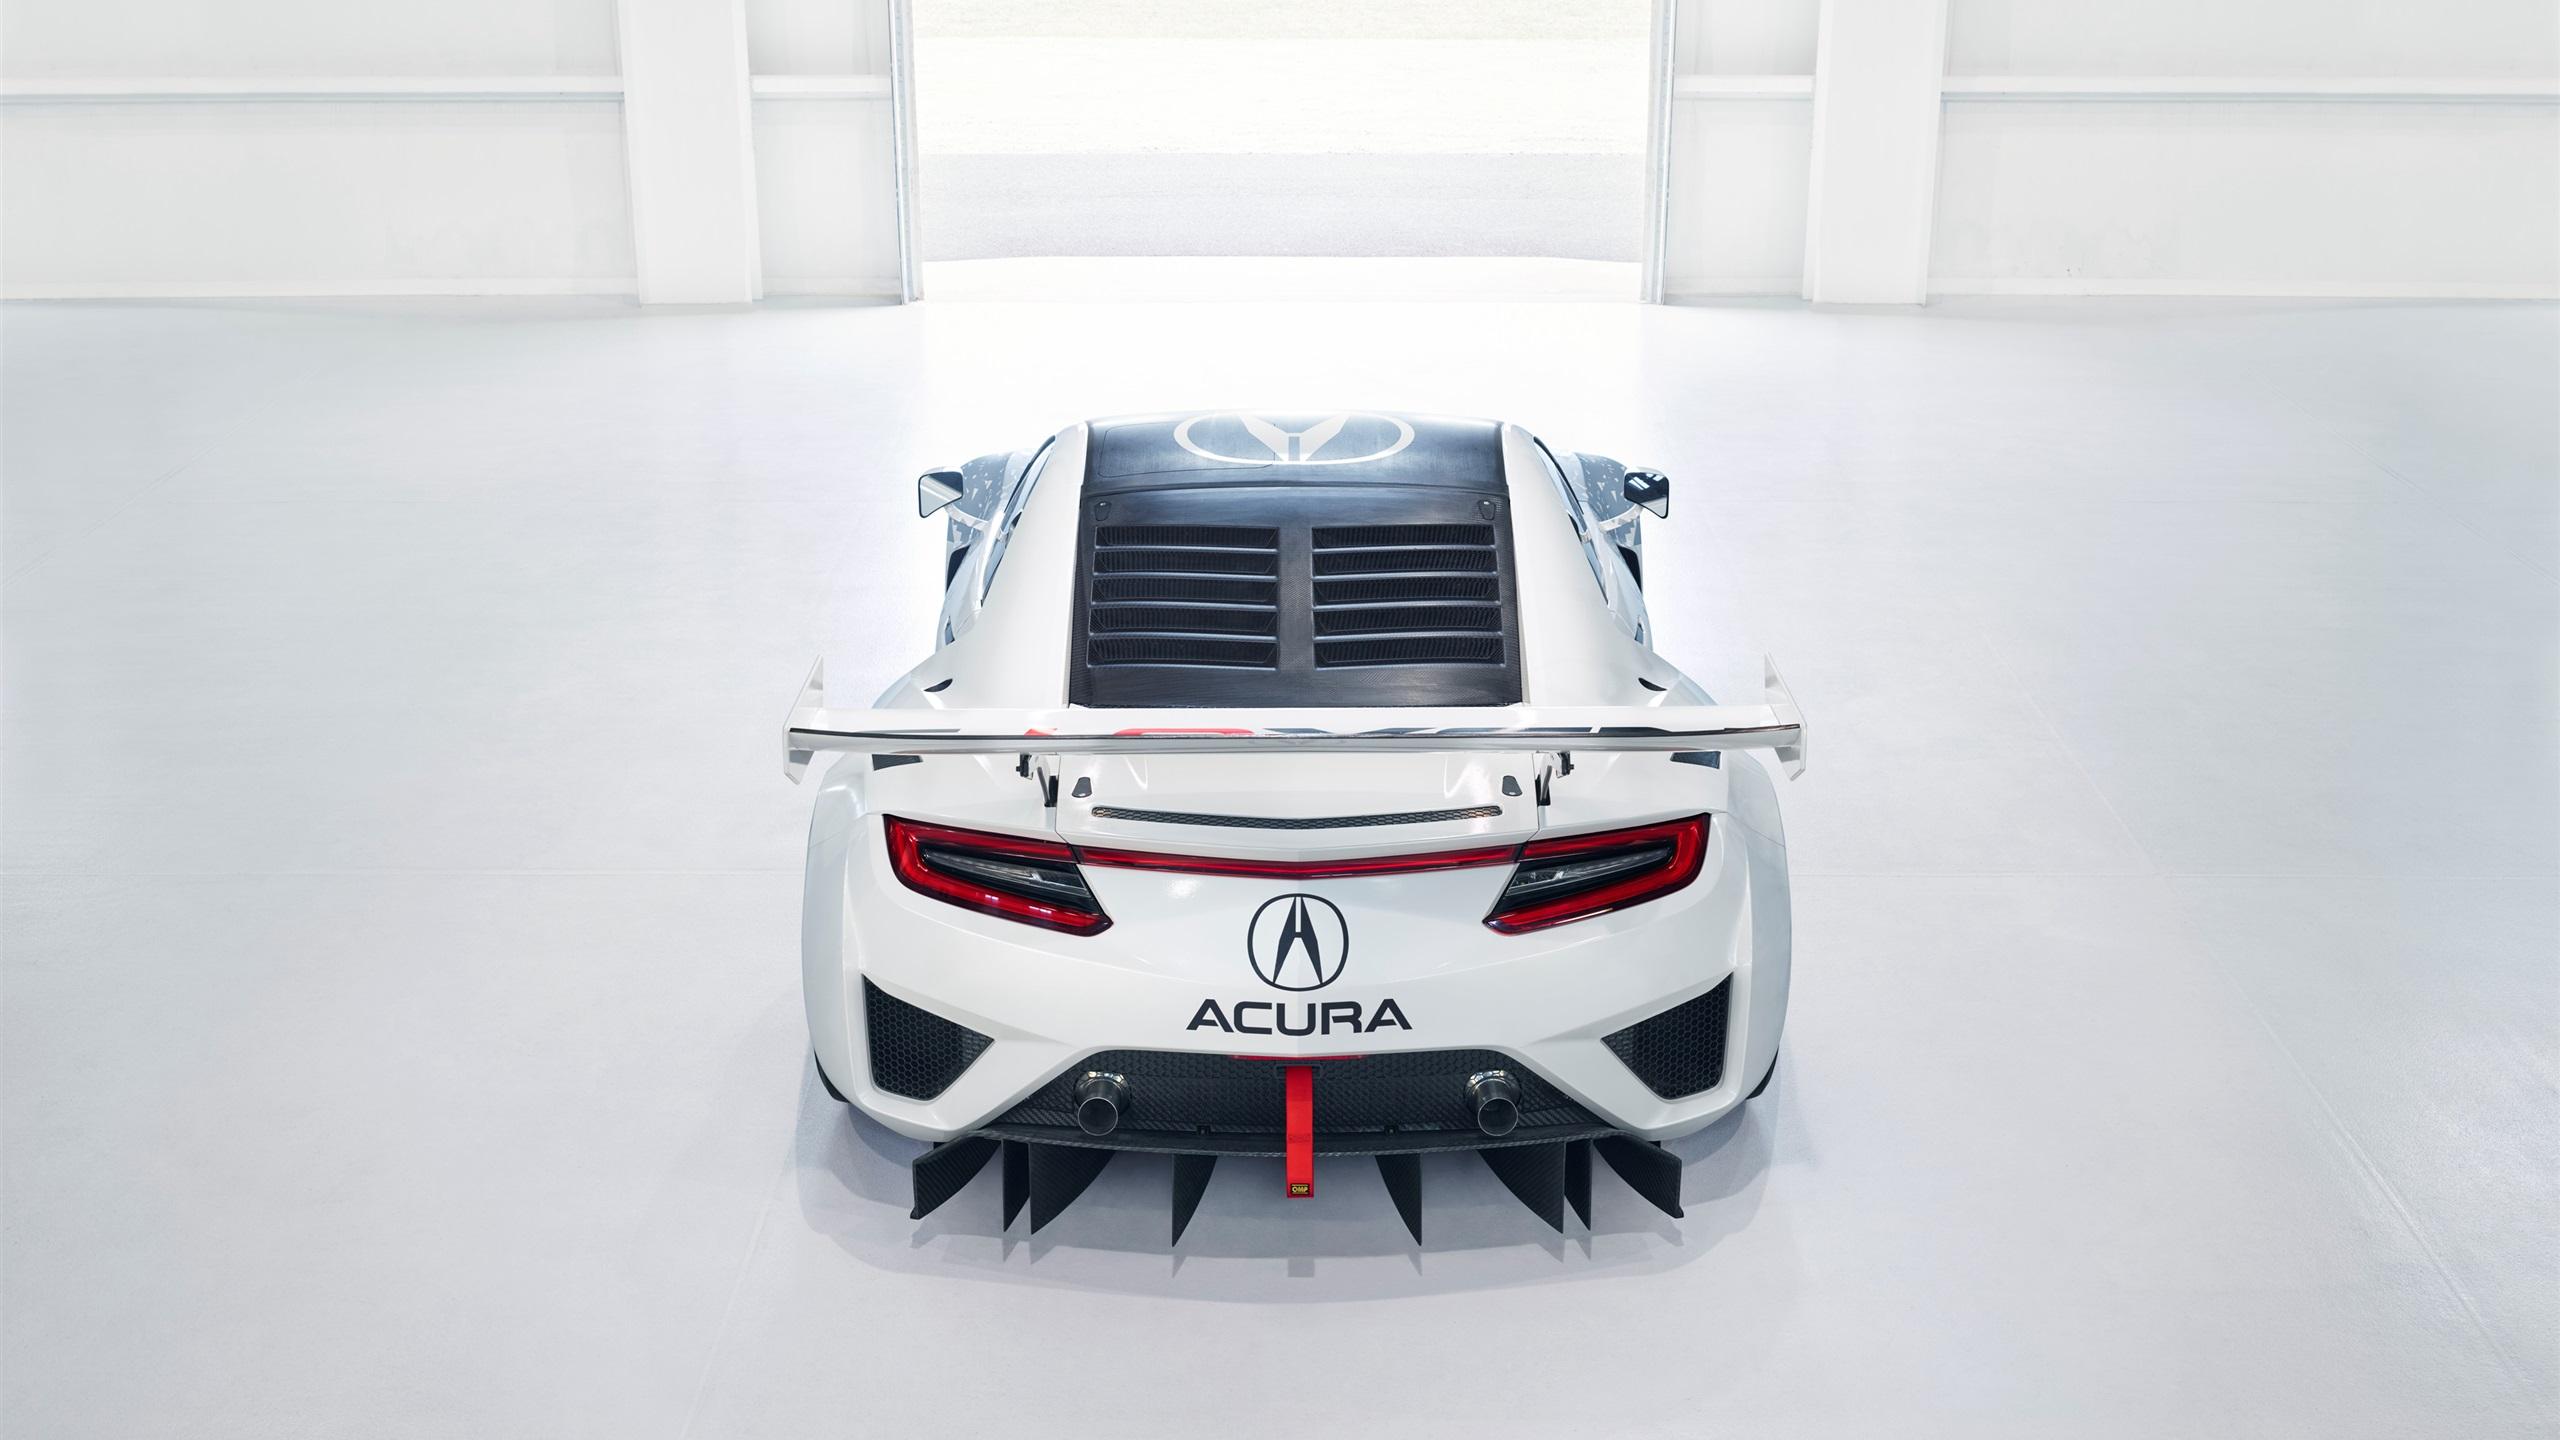 Wallpaper Acura Nsx Gt3 Supercar Back View 3840x2160 Uhd 4k